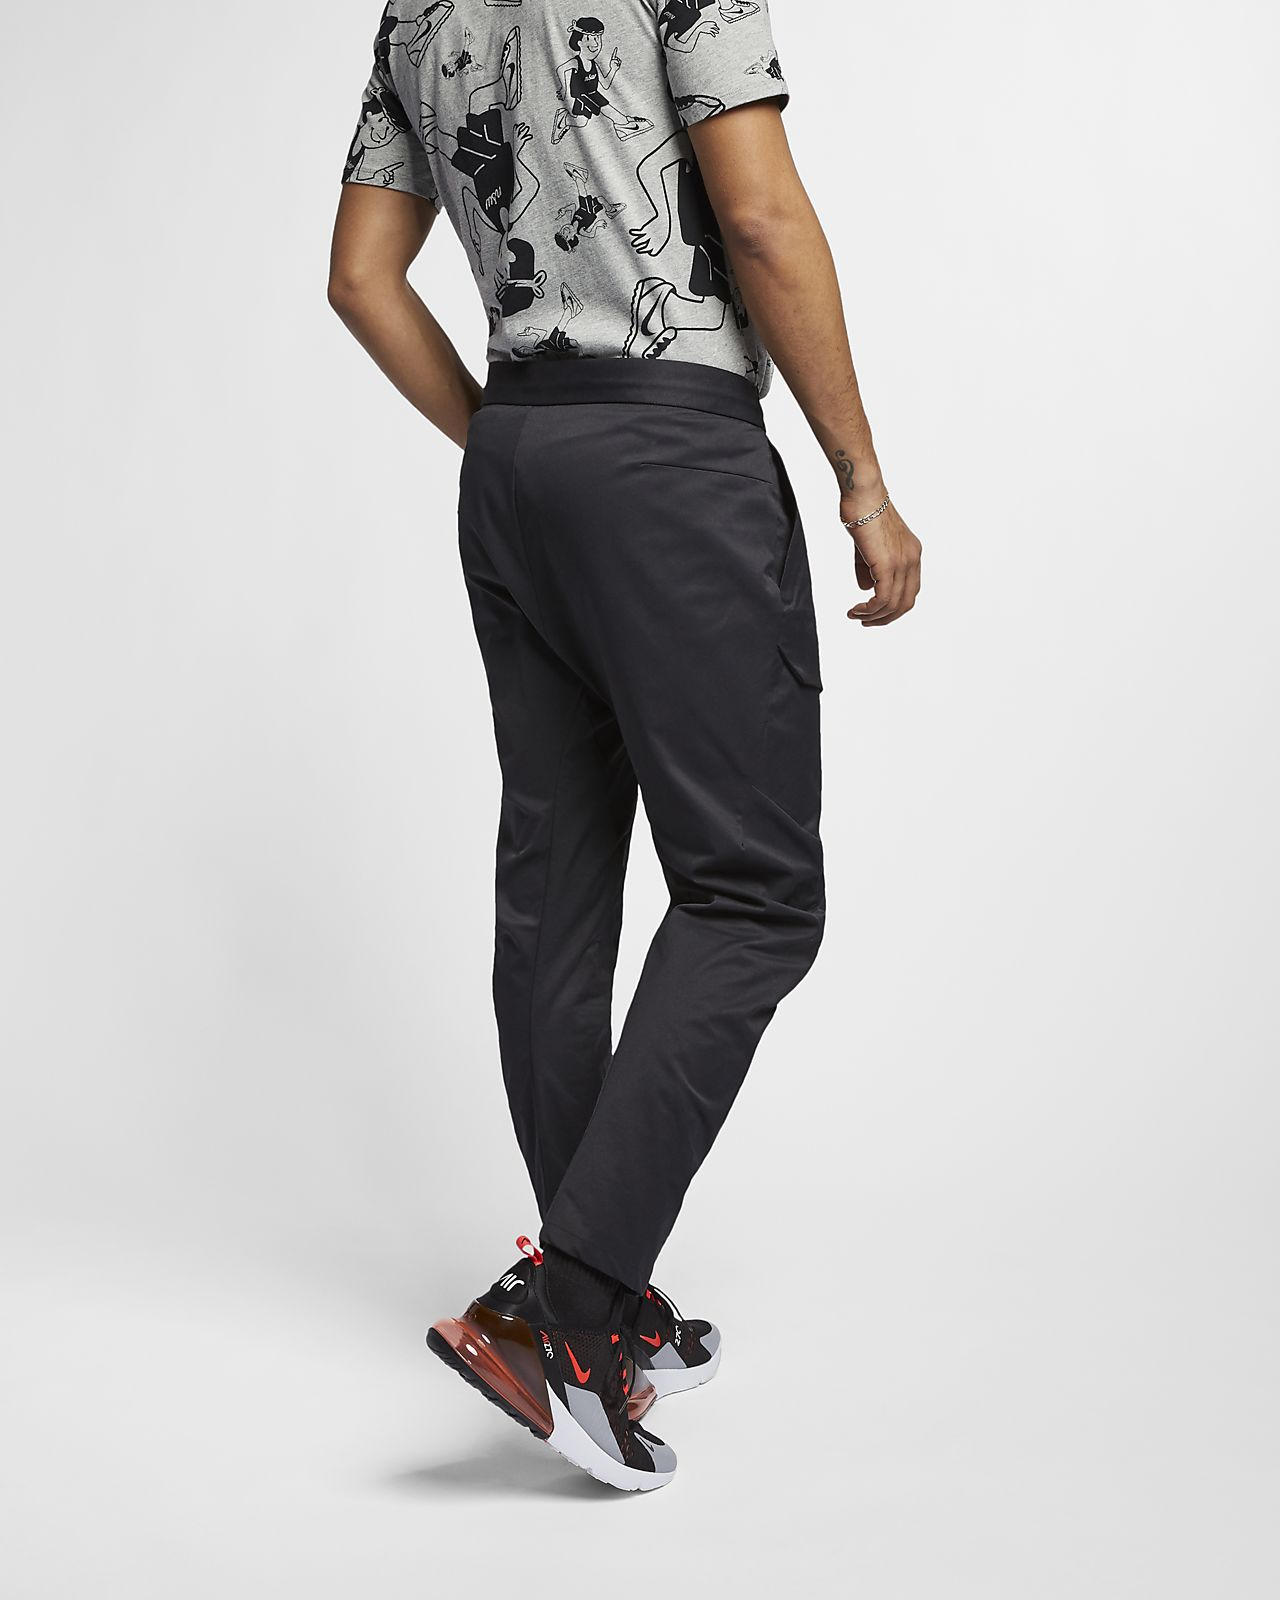 0409945431410 Nike Sportswear Tech Pack Men's Woven Cargo Trousers. Nike.com CA